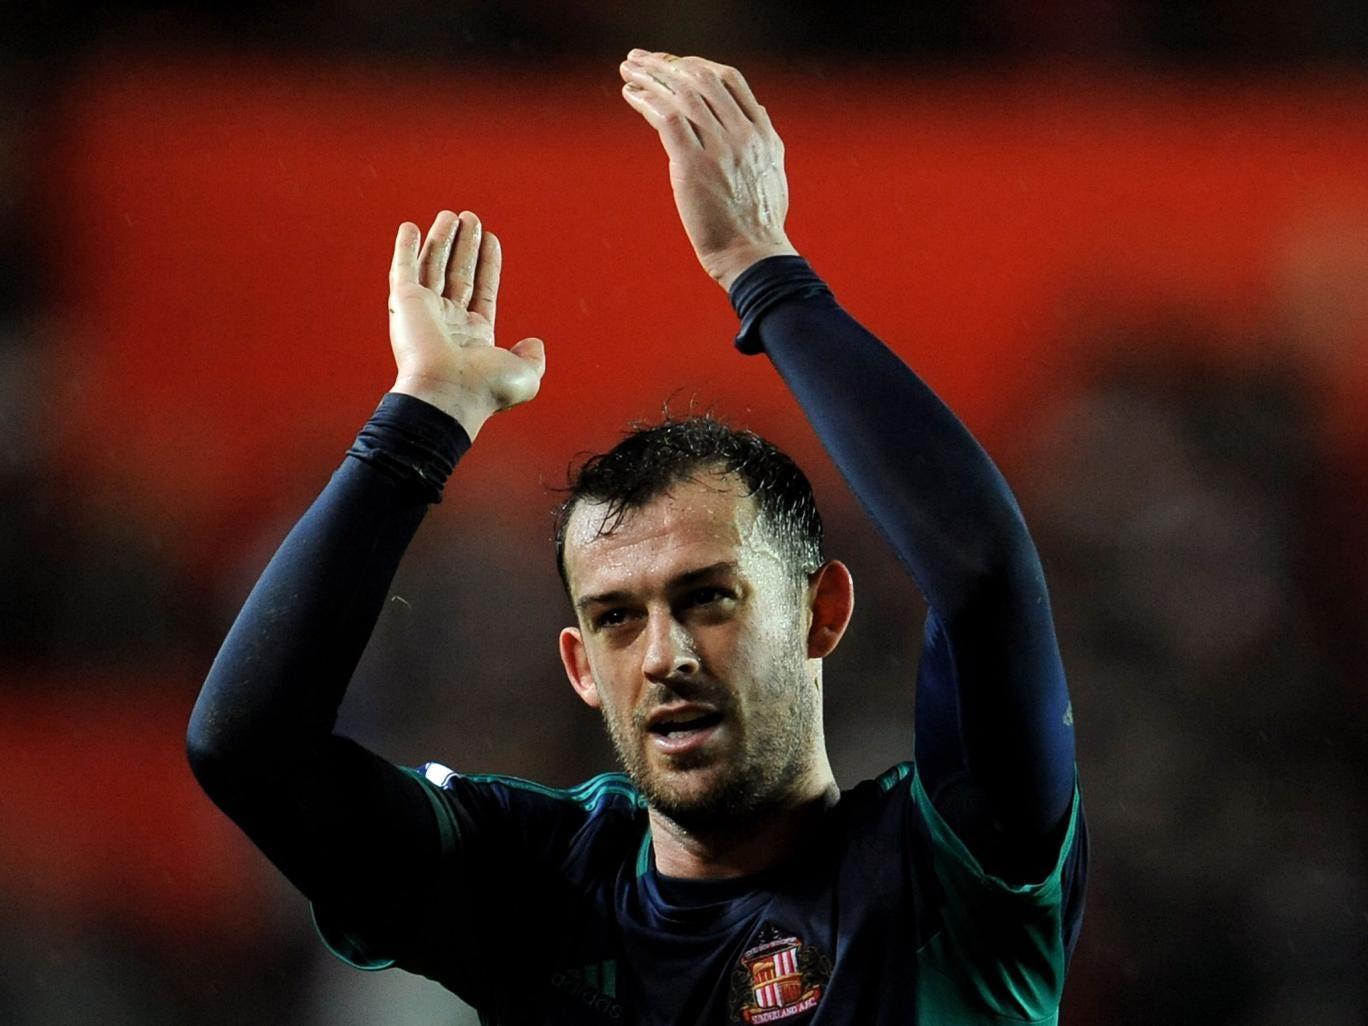 Goalscorer Steven Fletcher of Sunderland applauds the travelling fans